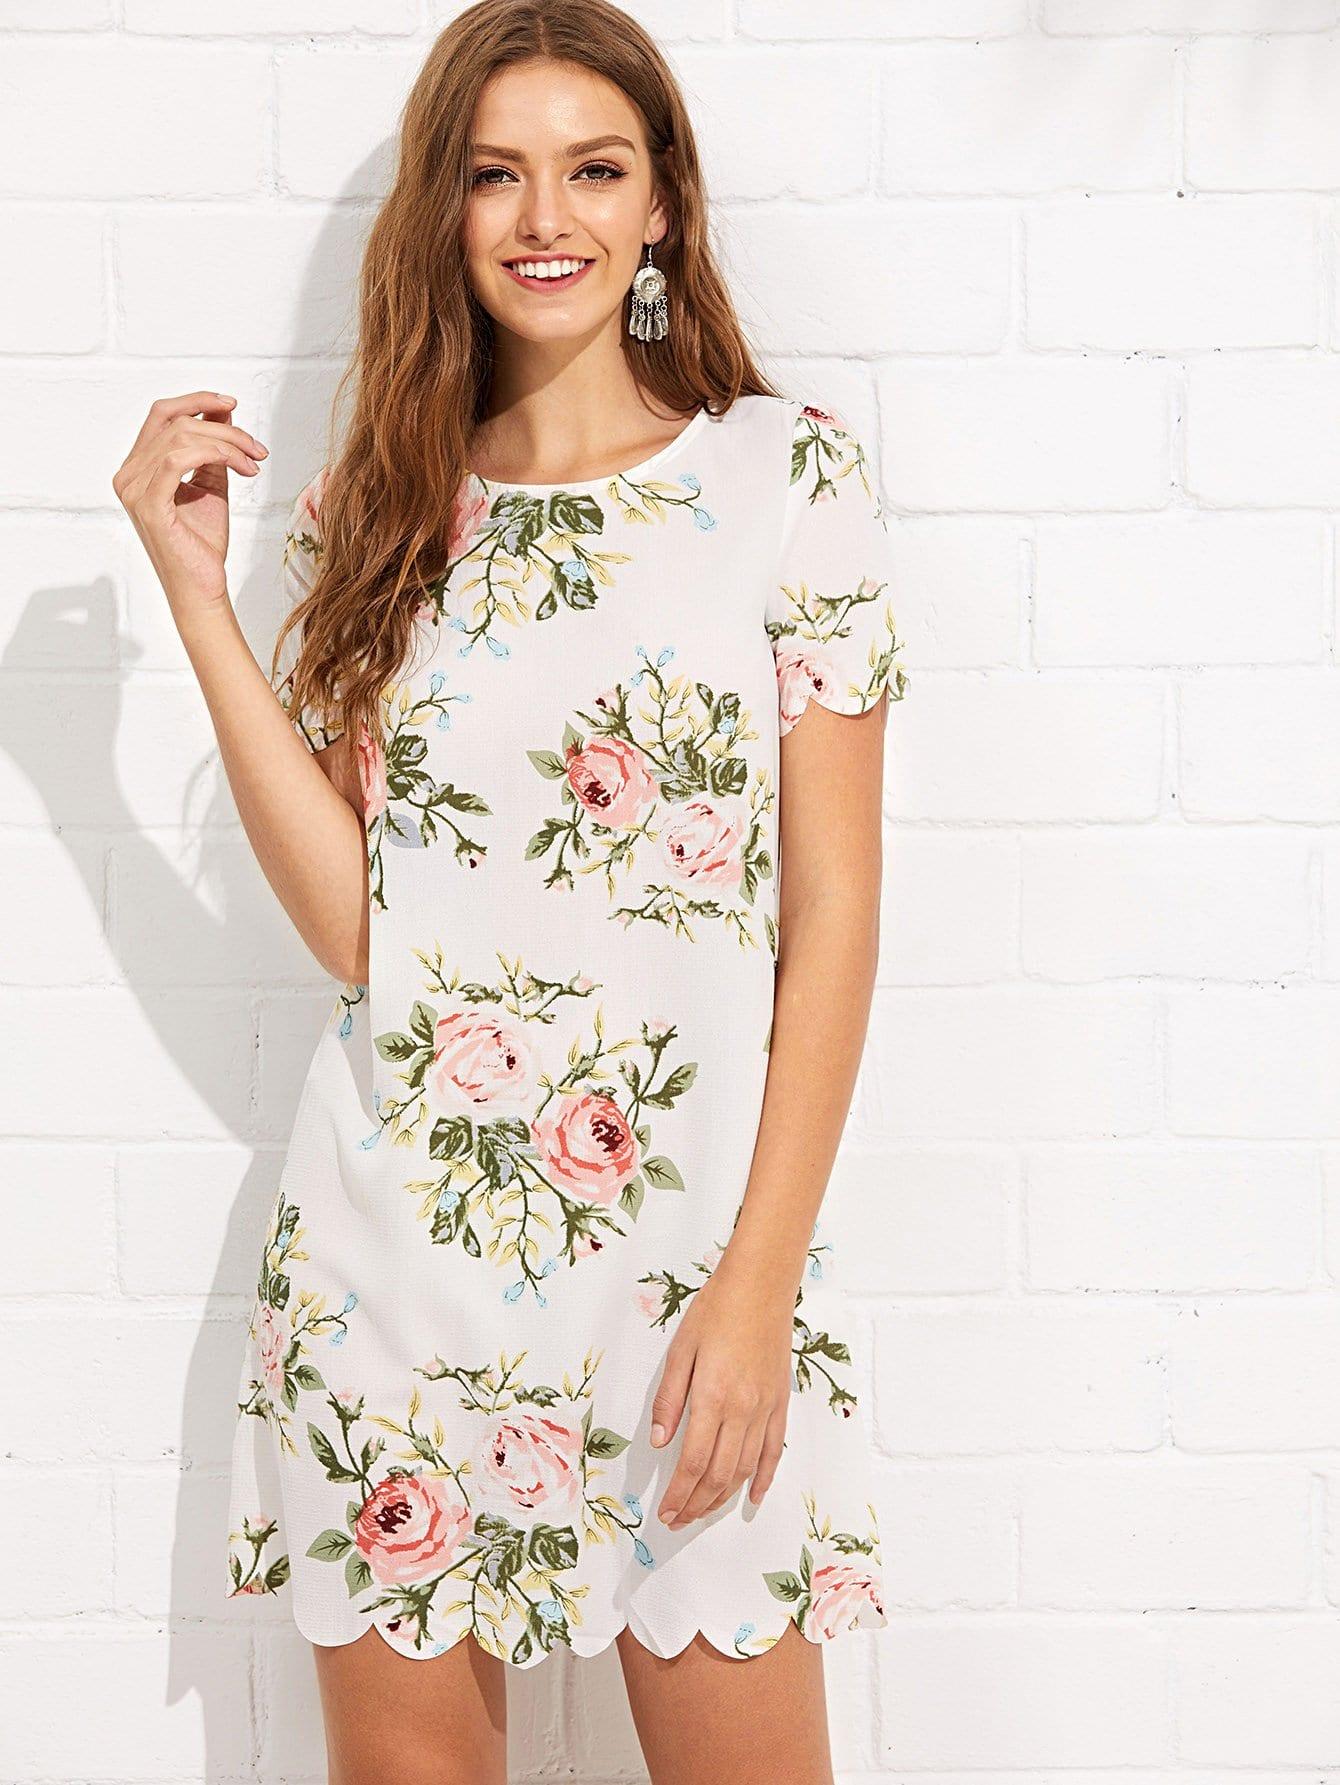 Scalloped Edge Botanical Print Dress scalloped edge botanical print dress